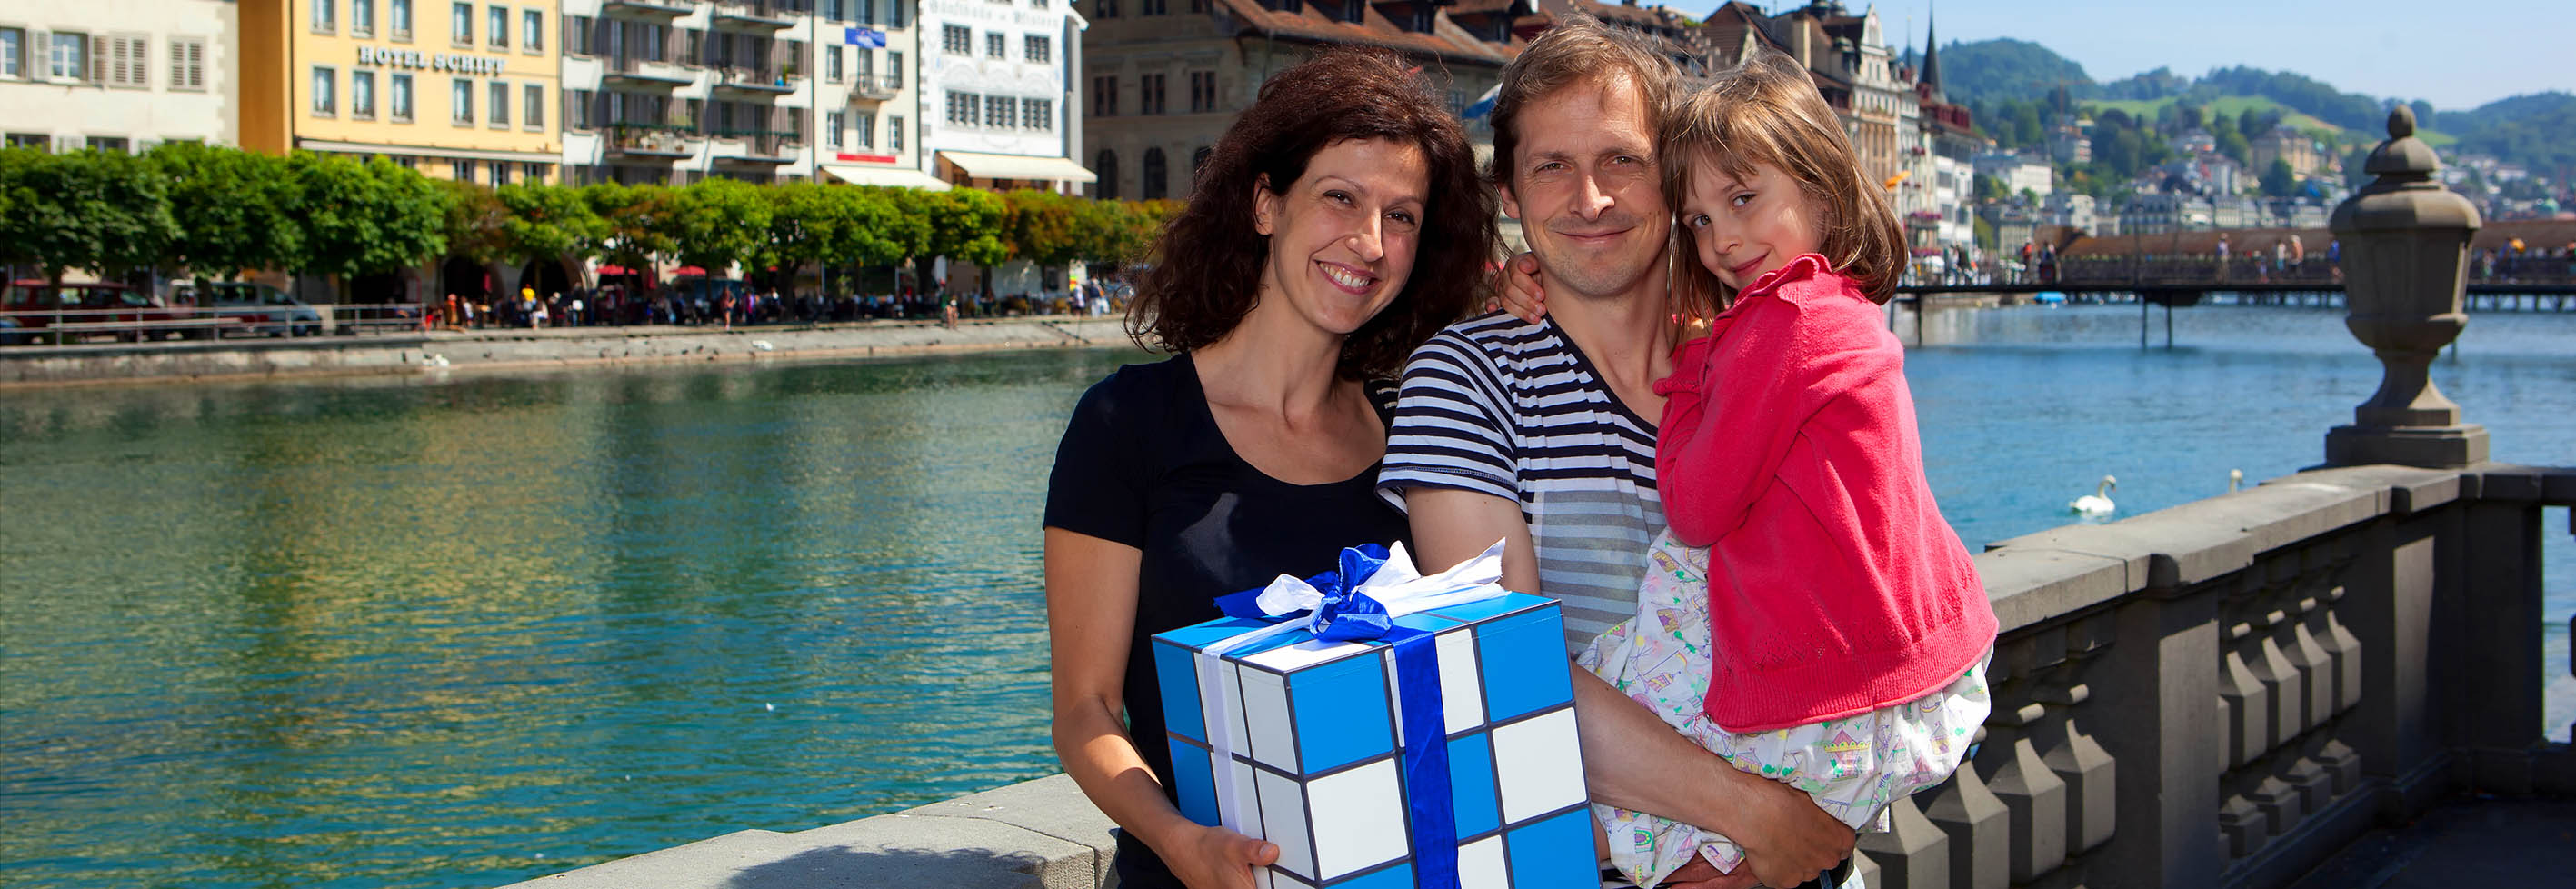 Neu in Luzern